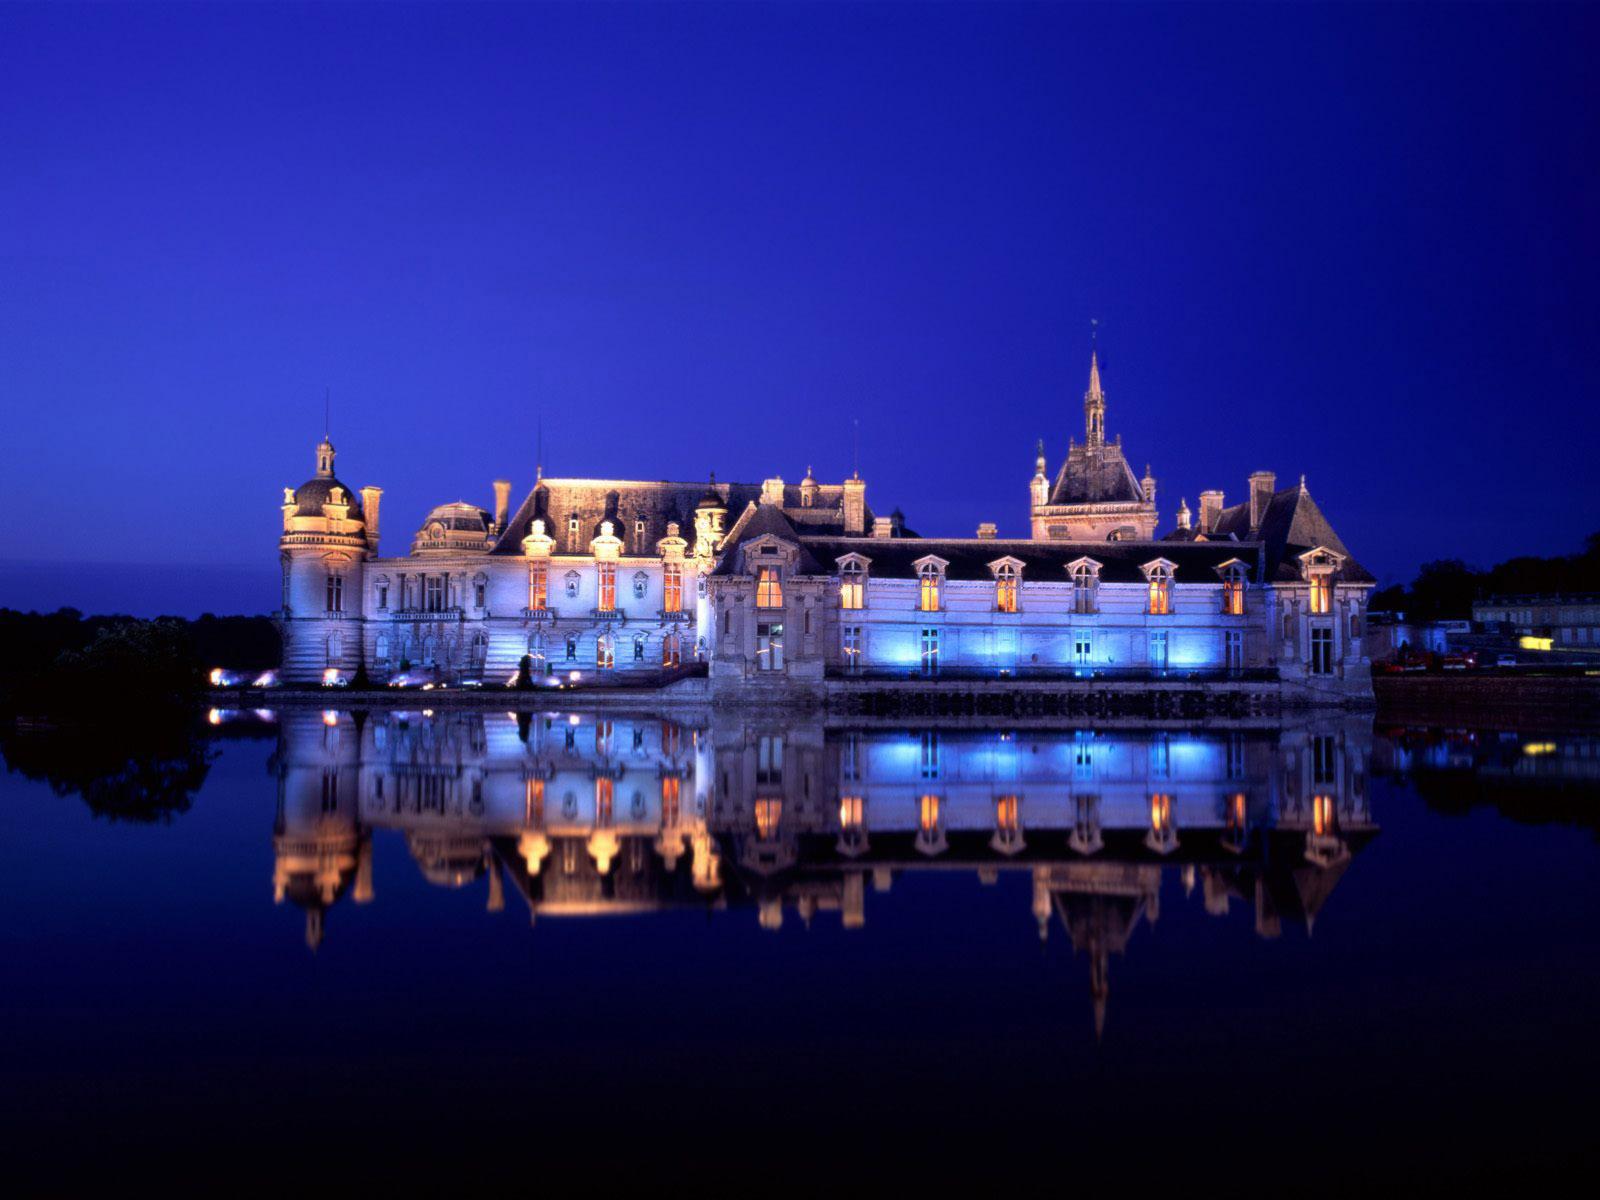 Chateau de Chantilly 3 Chantilly 4 France